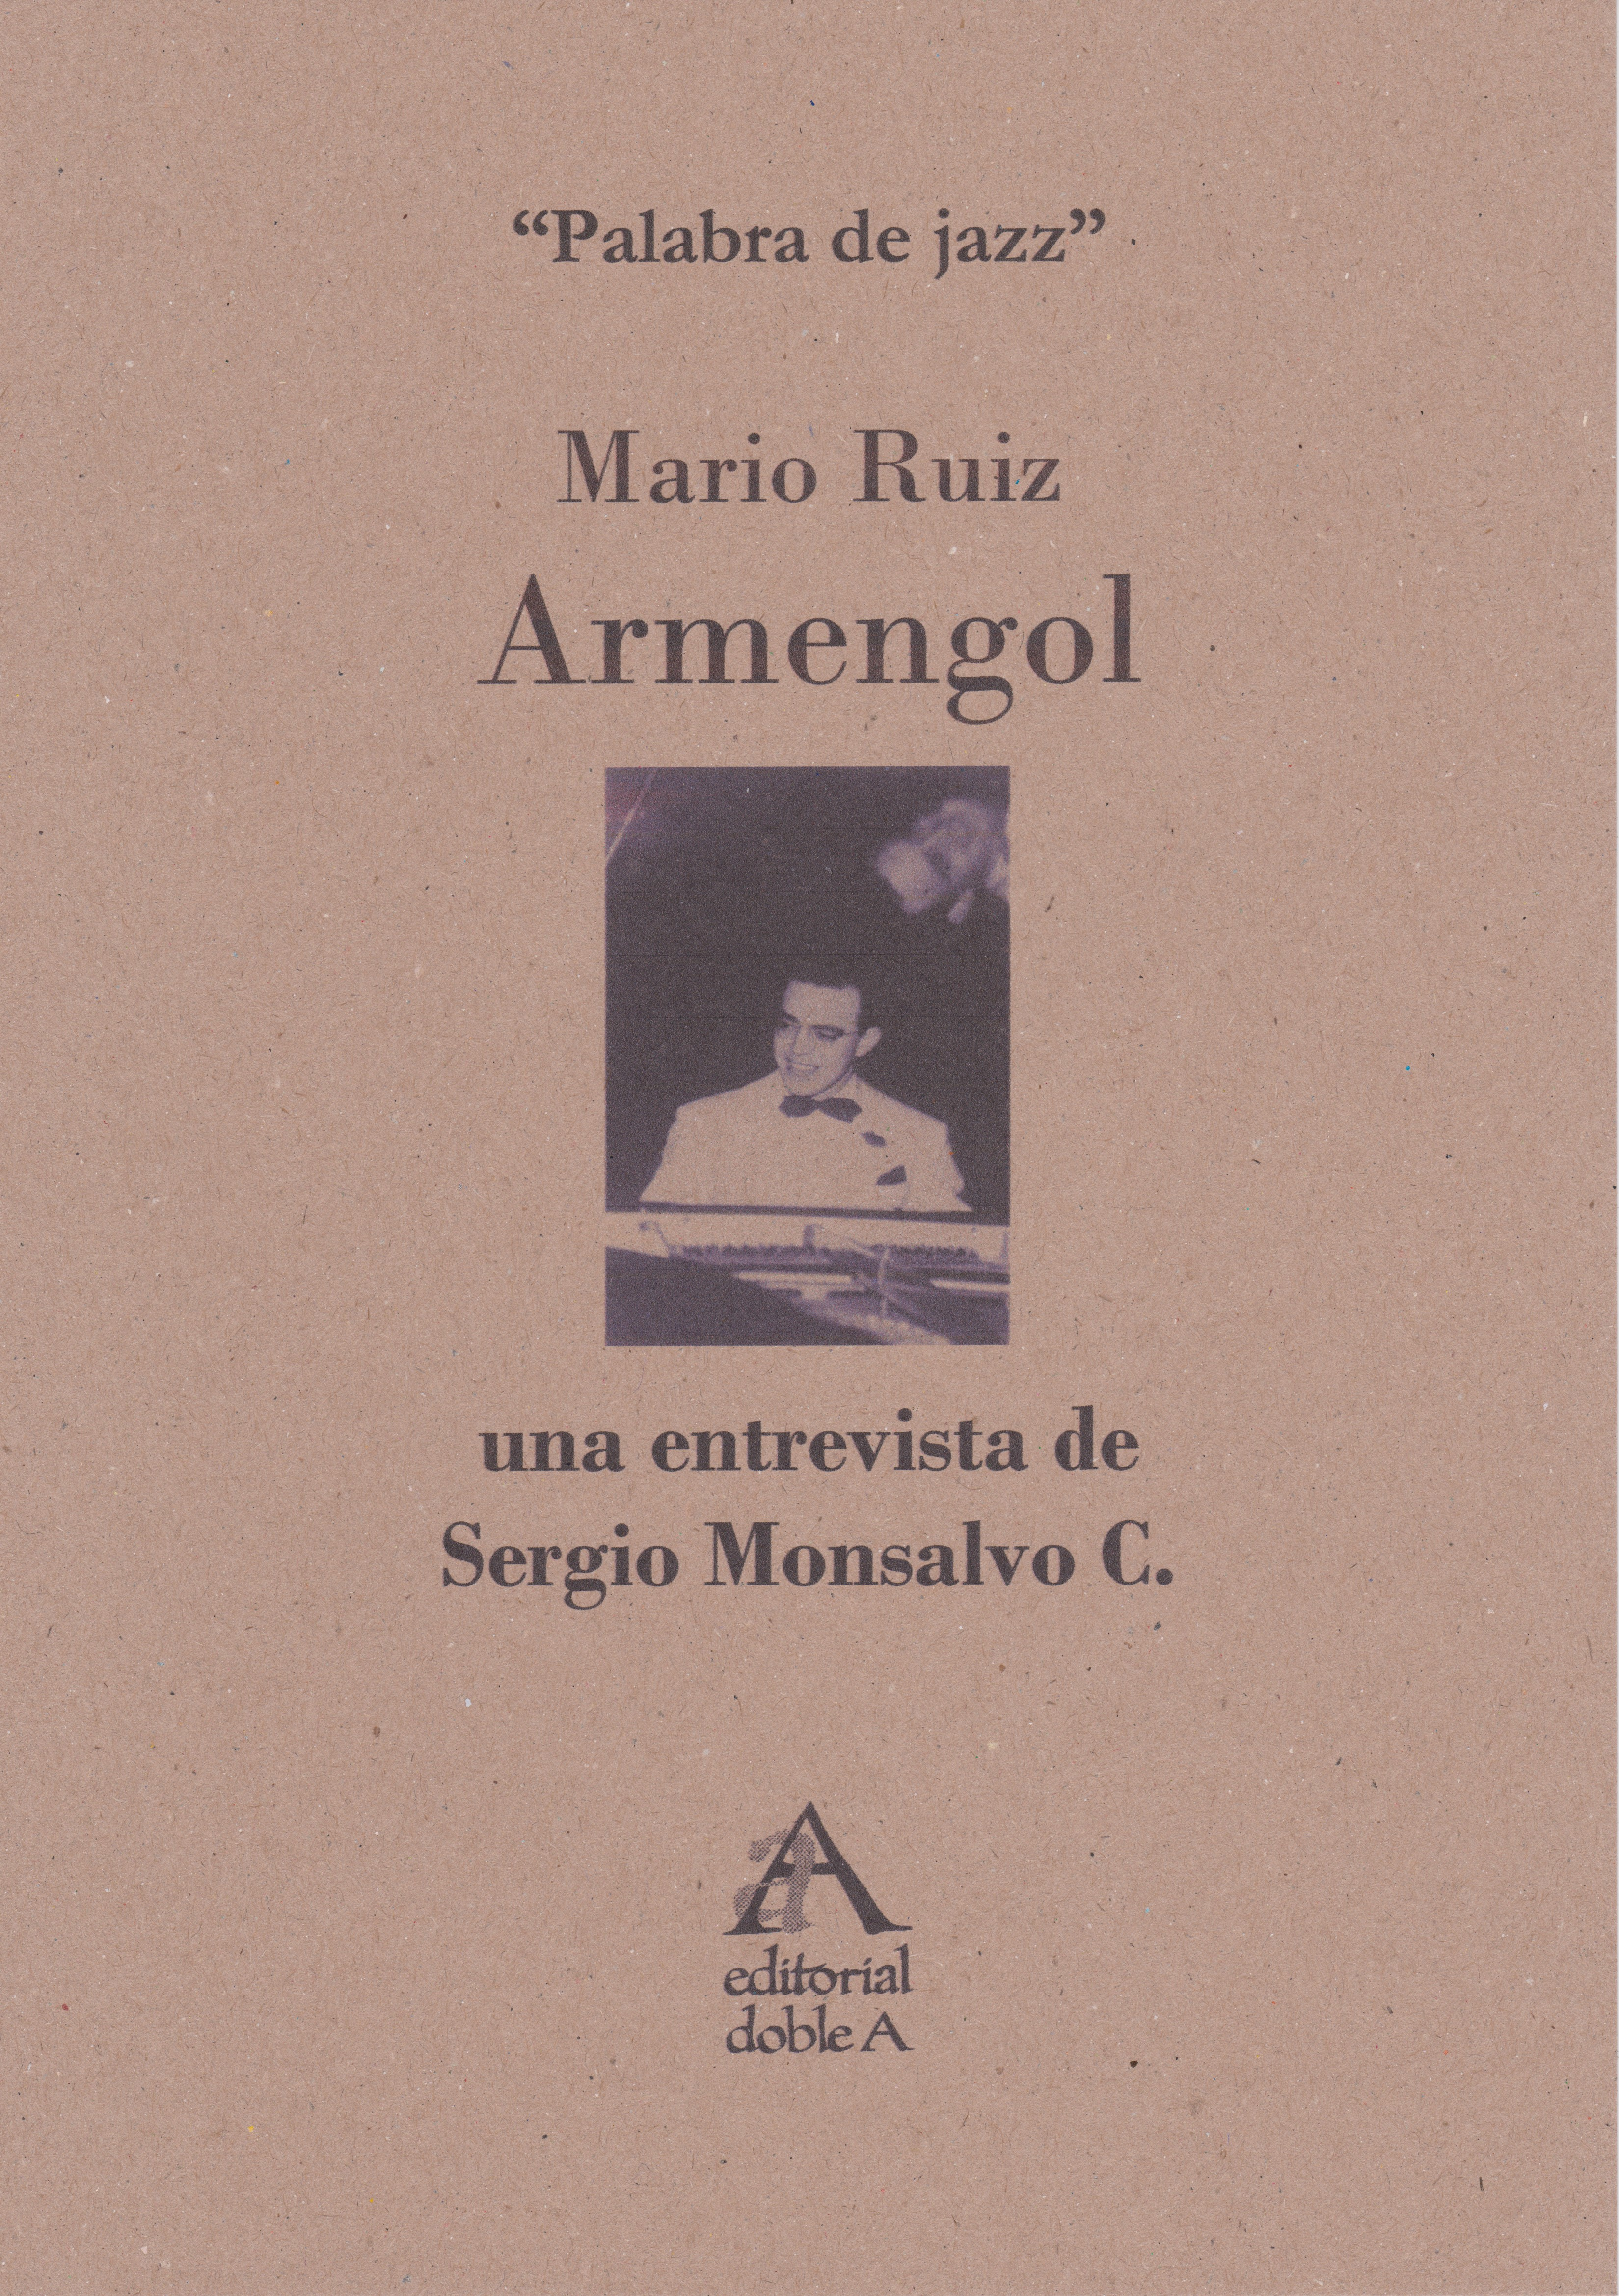 MARIO RUIZ ARMENGOL (PORTADA)